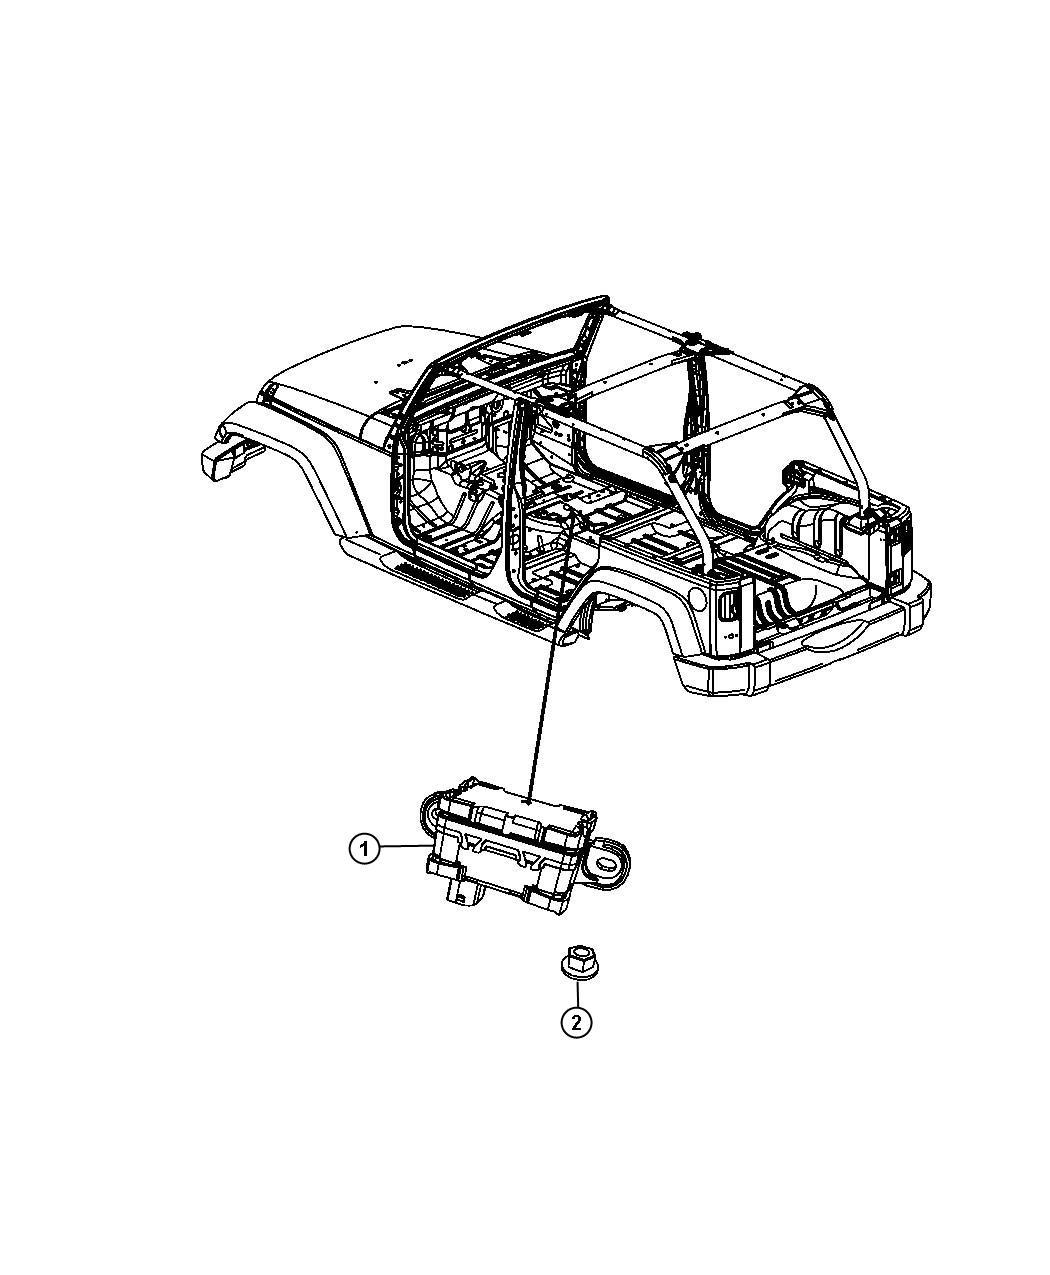 Jeep Wrangler Sensor. Dynamics. Lateral acceleration and